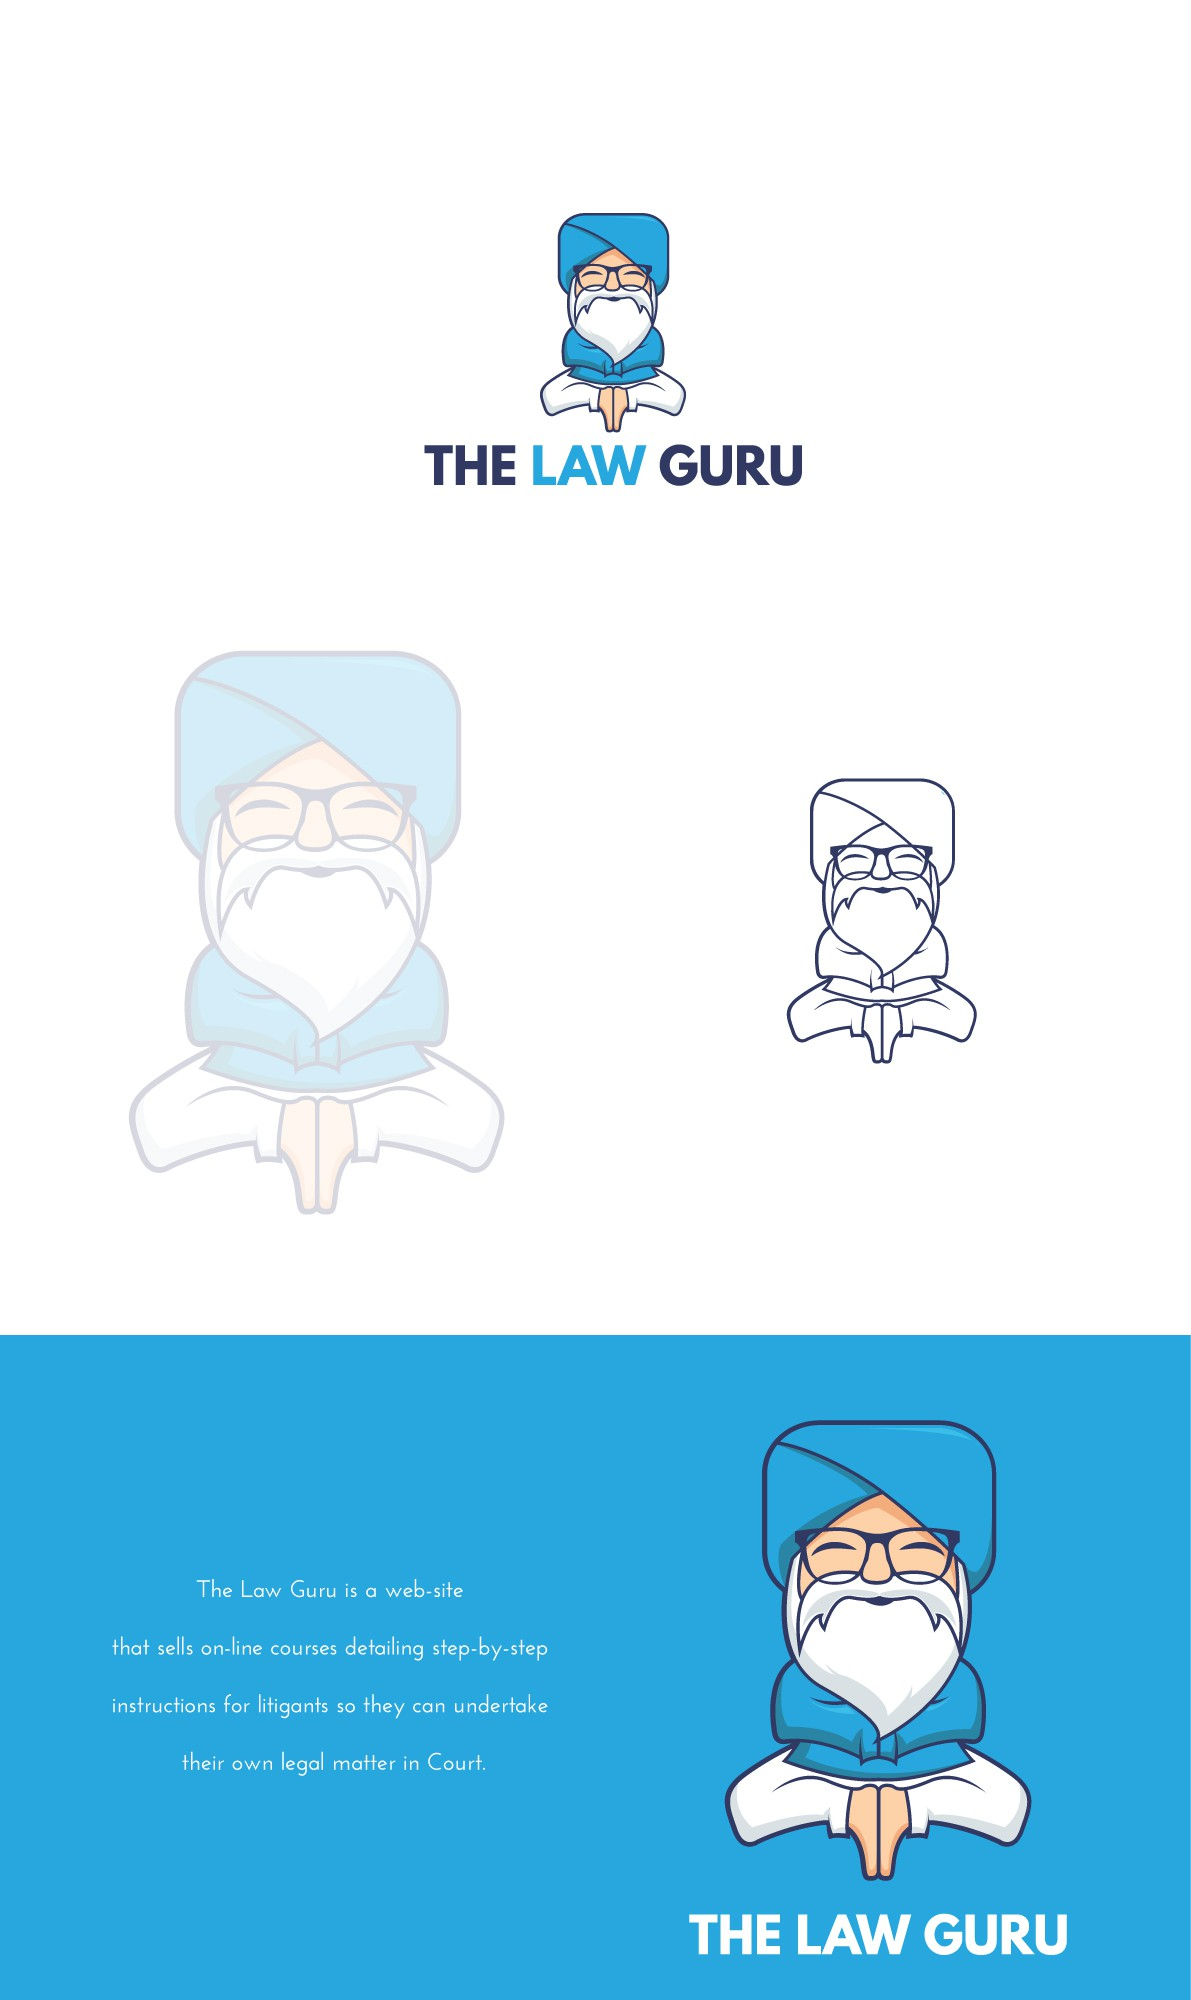 Law Guru logo: Fresh vibrant logo for web-site providing legal e-courses